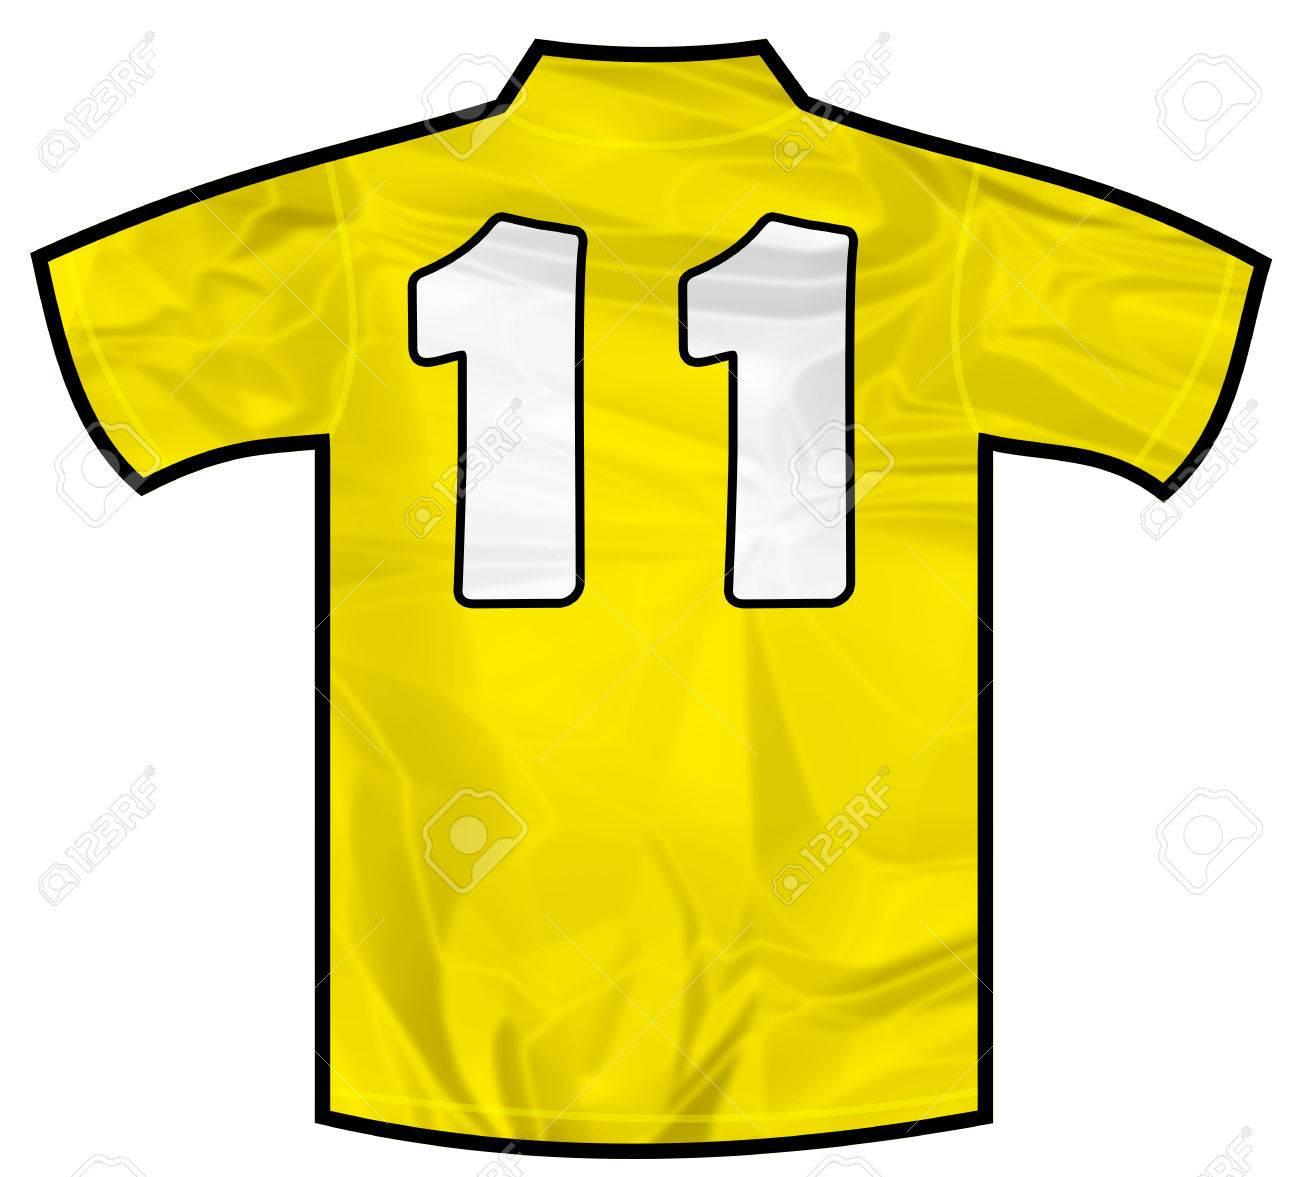 295ef3e09d7b Foto de archivo - Número 11 once camisa deportiva amarilla como fútbol,  ??hockey, baloncesto, rugby, béisbol, voleibol o equipo de fútbol camiseta.